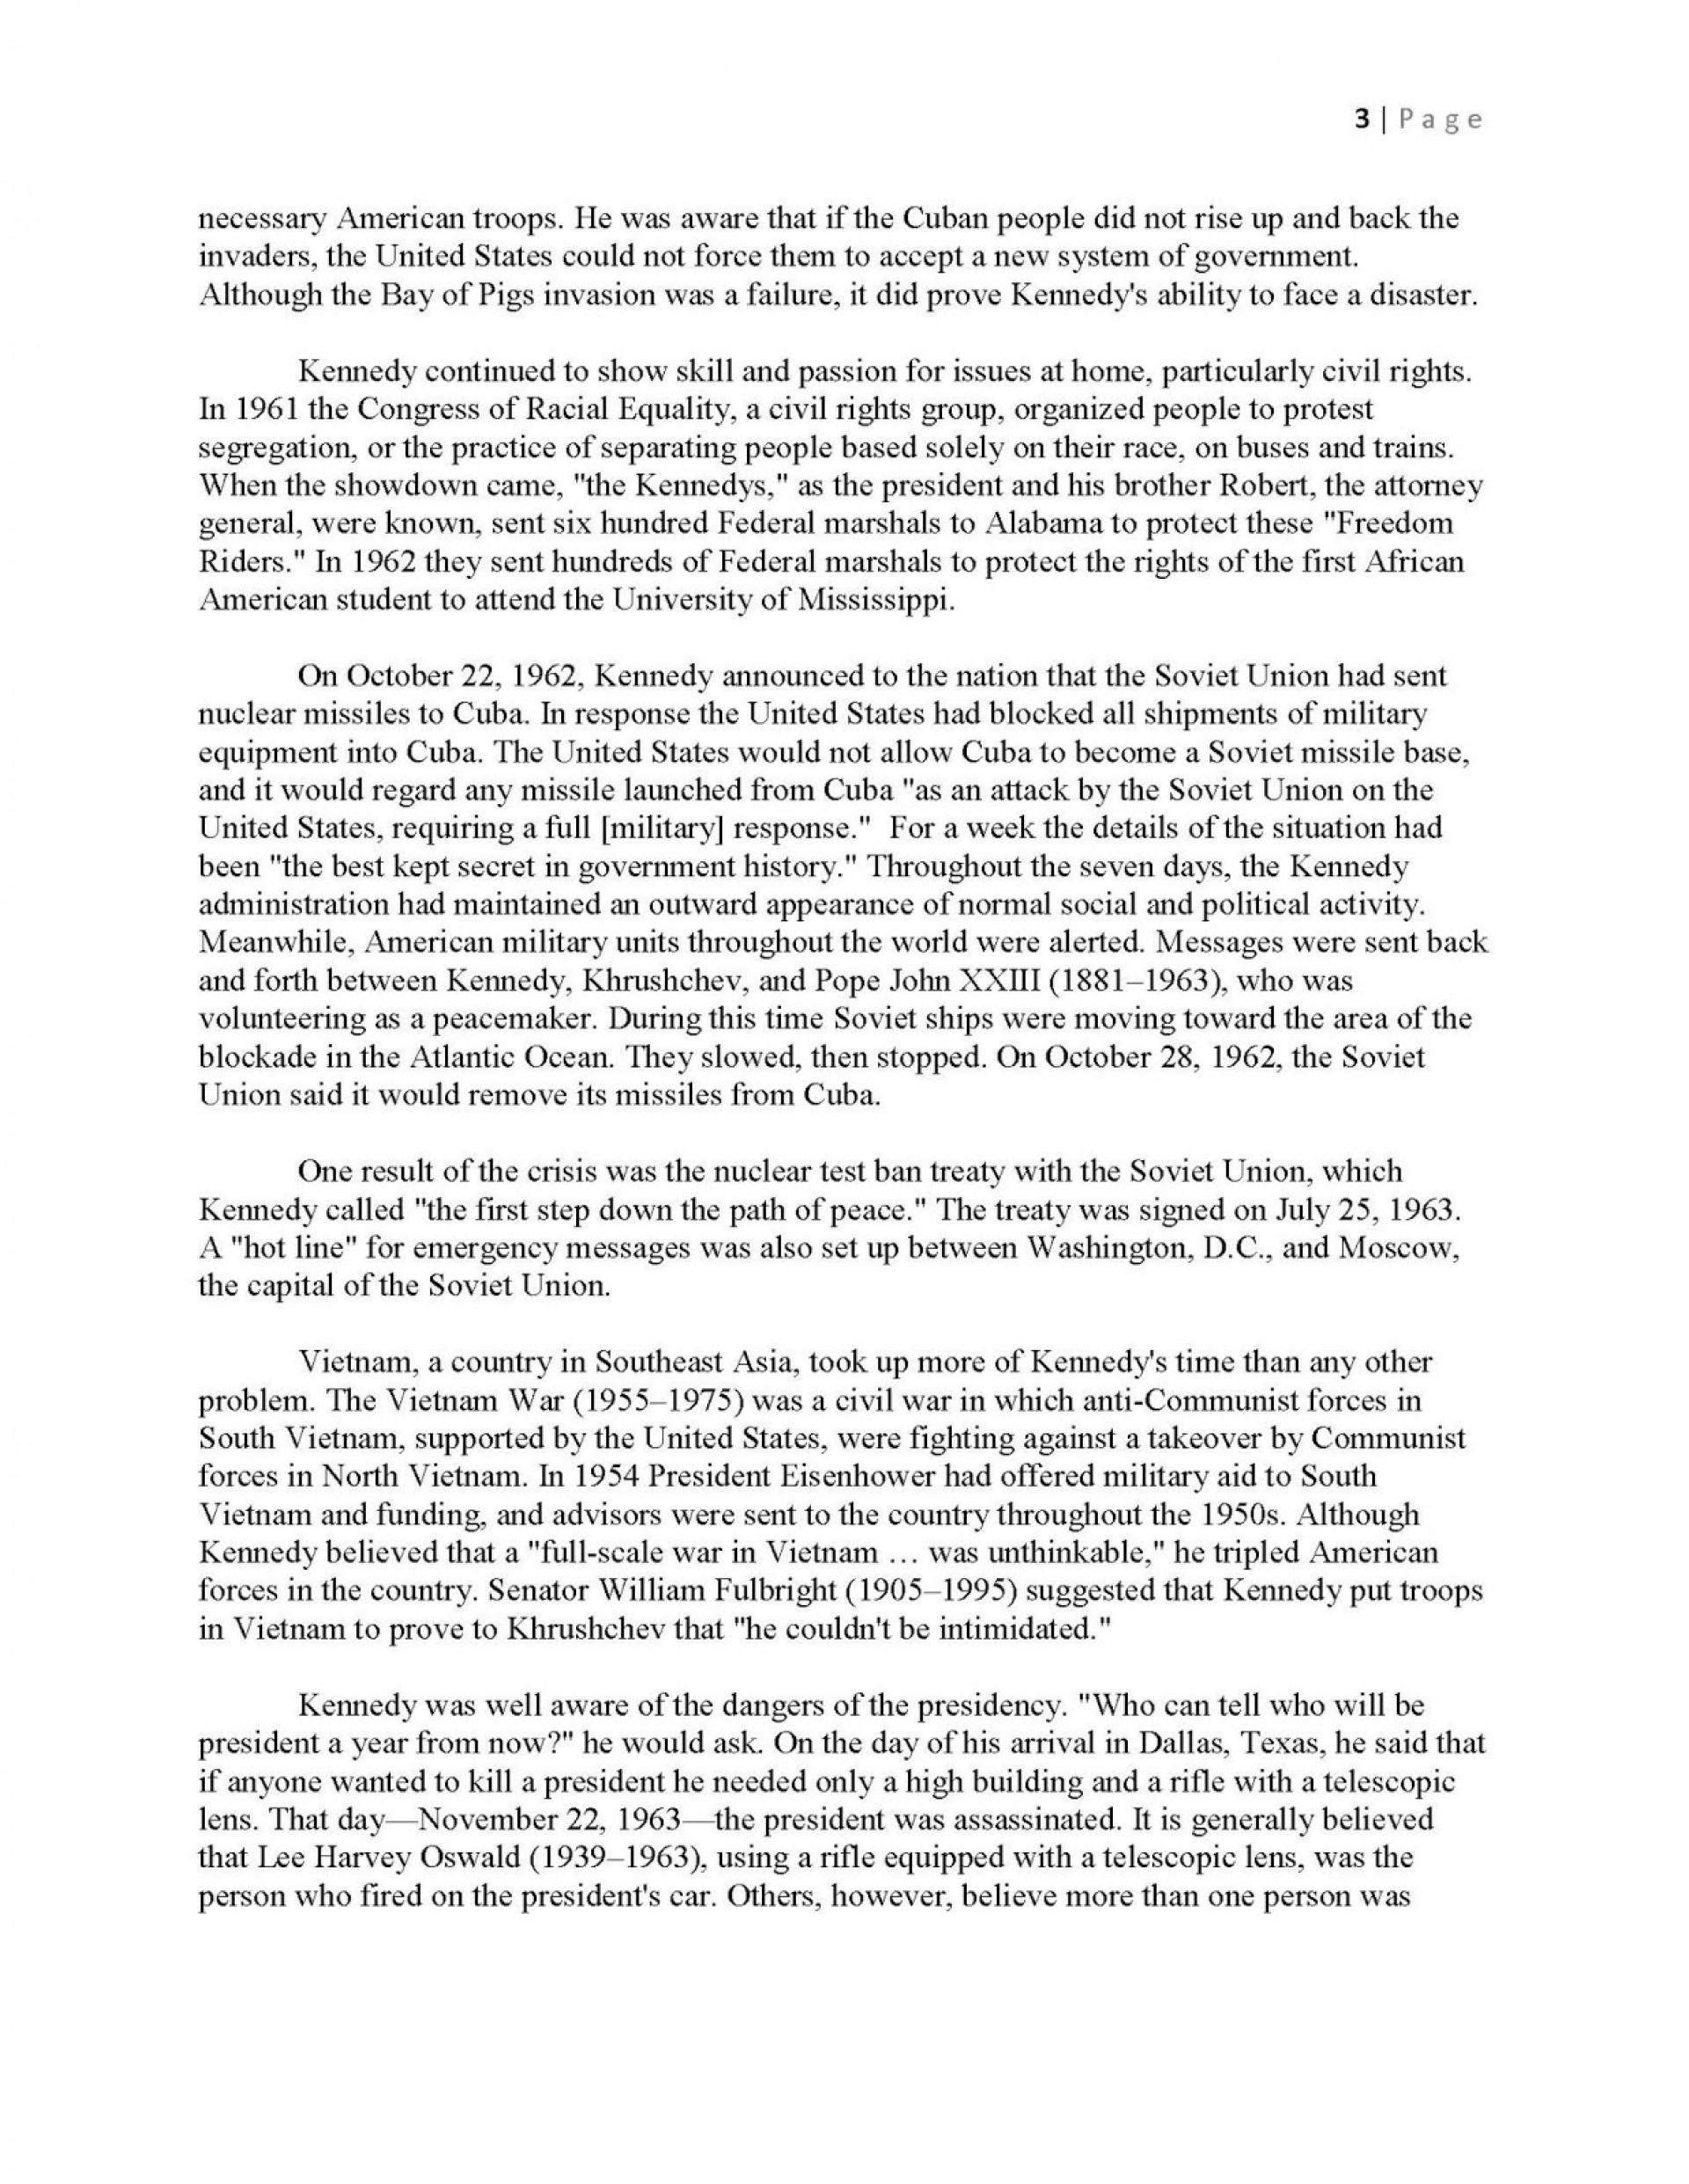 023 Mla Format Narrative Essay Jfkmlashortformbiographyreportexample Page 3 Staggering 1920